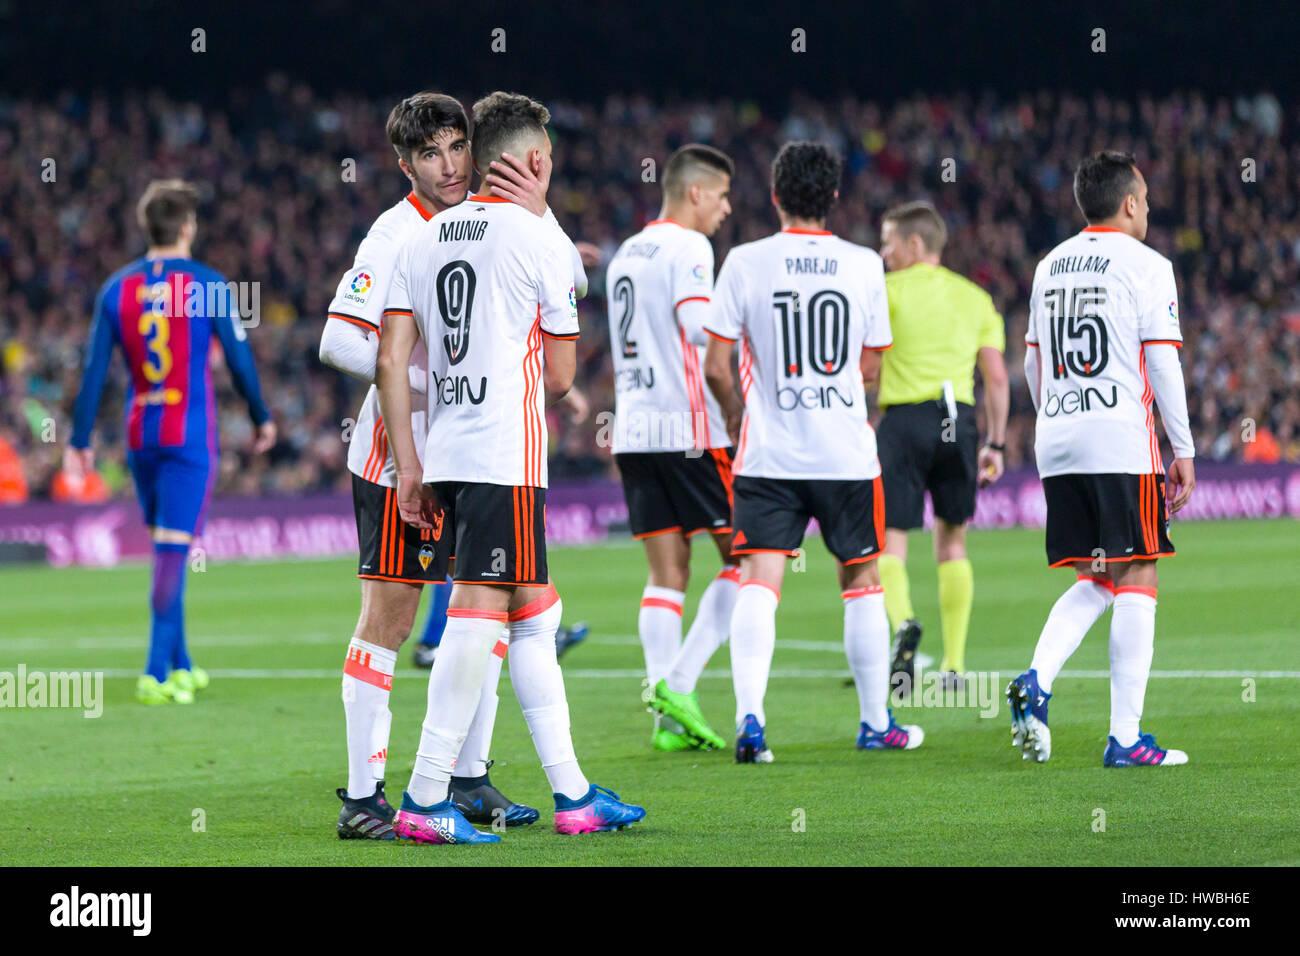 82a418d6966 March 19, 2017: Munir El Haddadi celebrates scoring the goal during the  match between